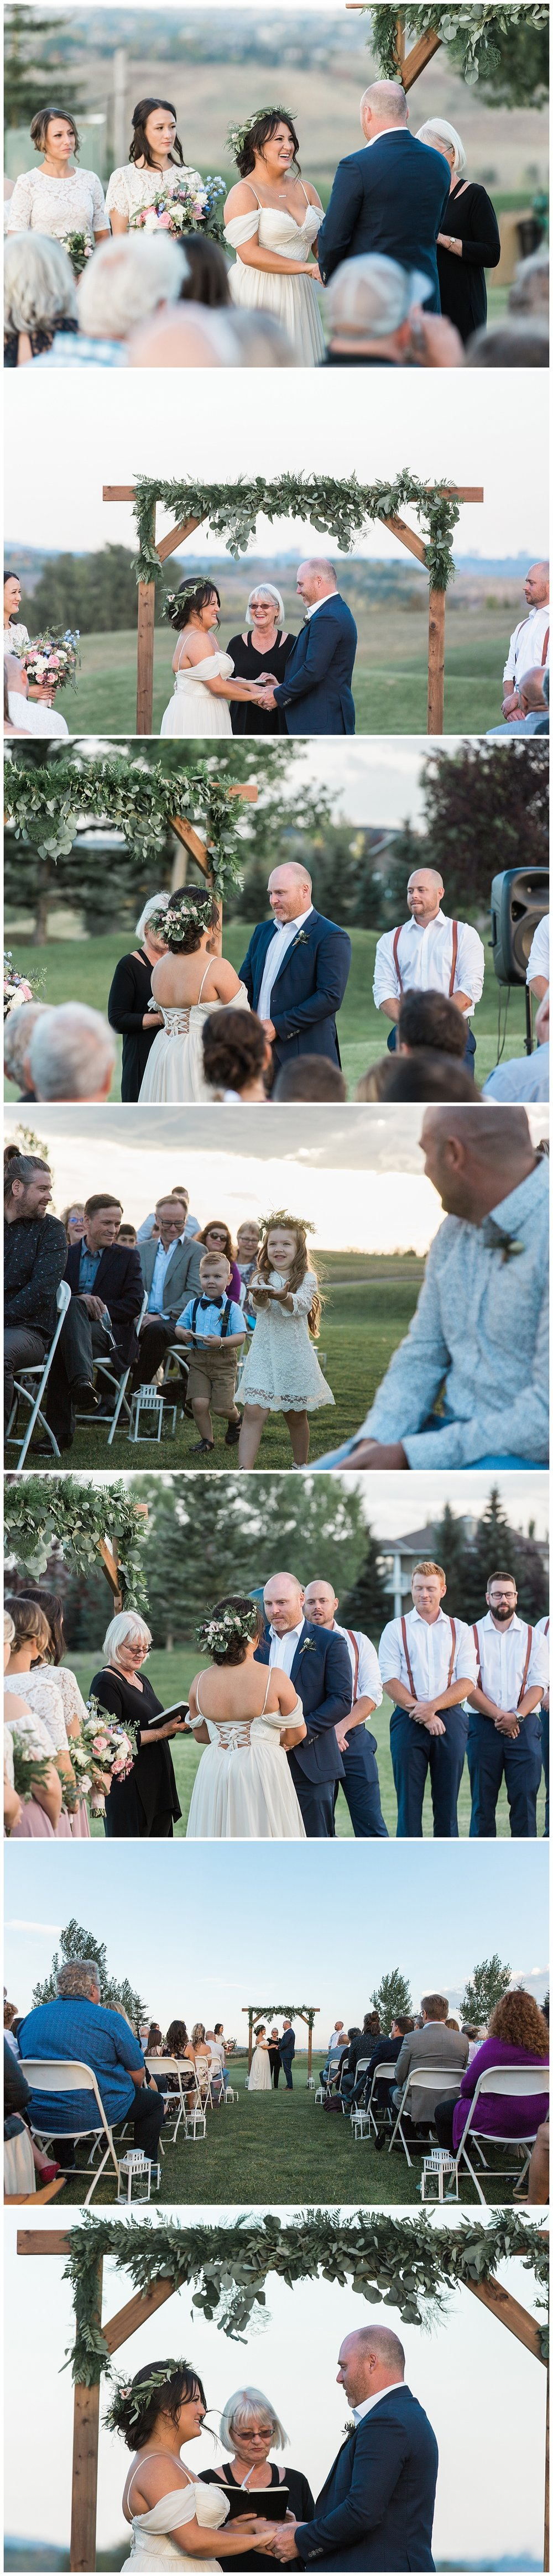 Calgary-wedding-photographer-springbank-links-golf-course-_0016.jpg